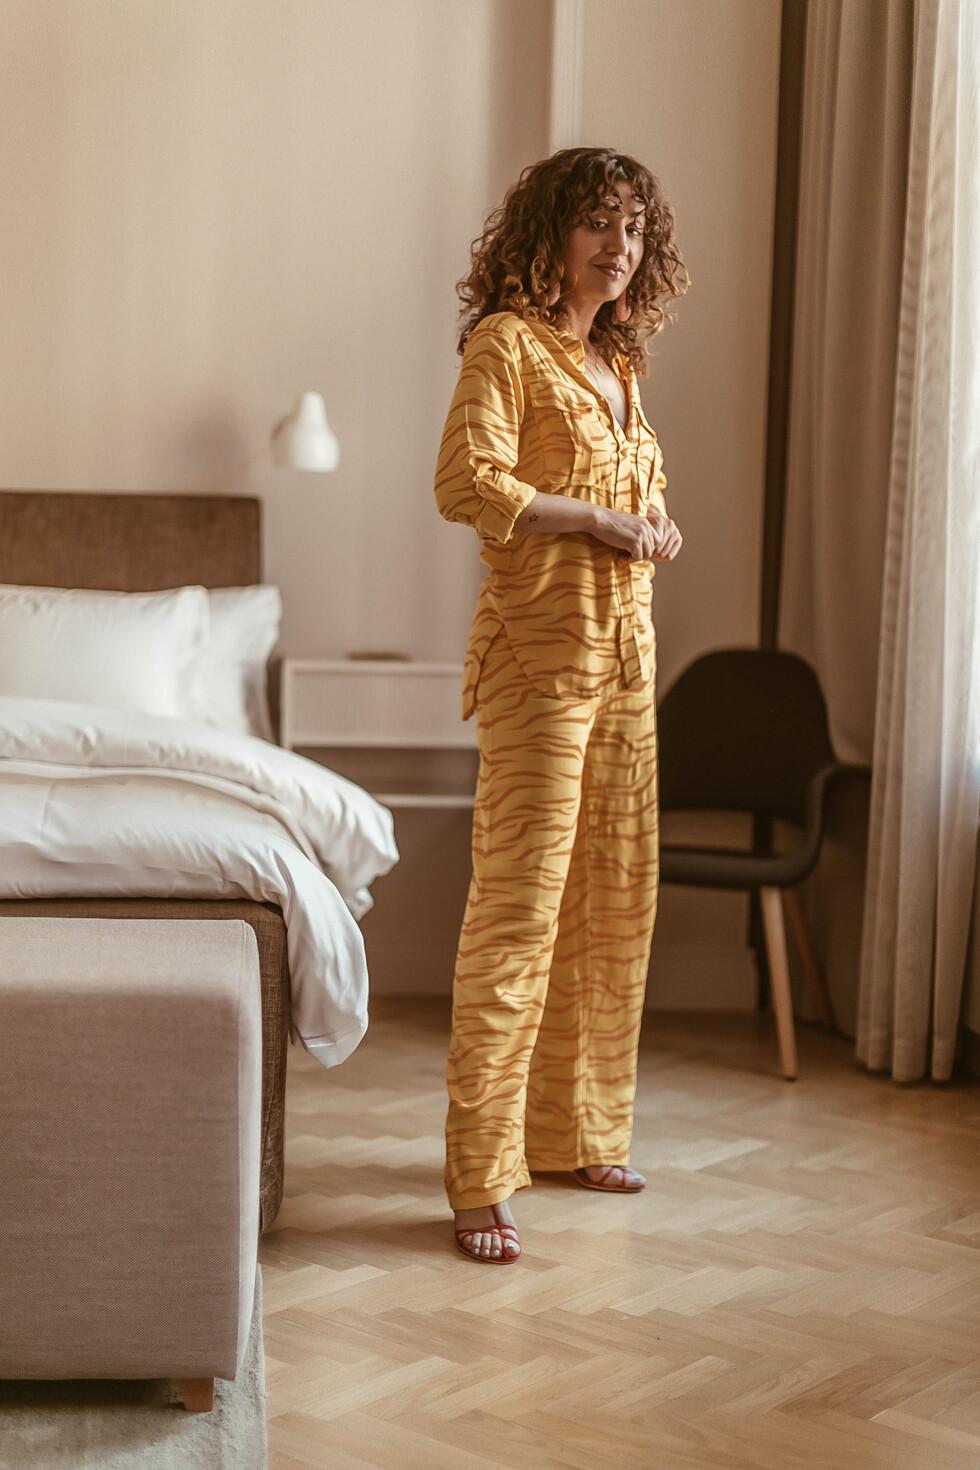 sara-che-avenue-tropical-tiger-set-shirt-pants-helsinki-st-george-hotel